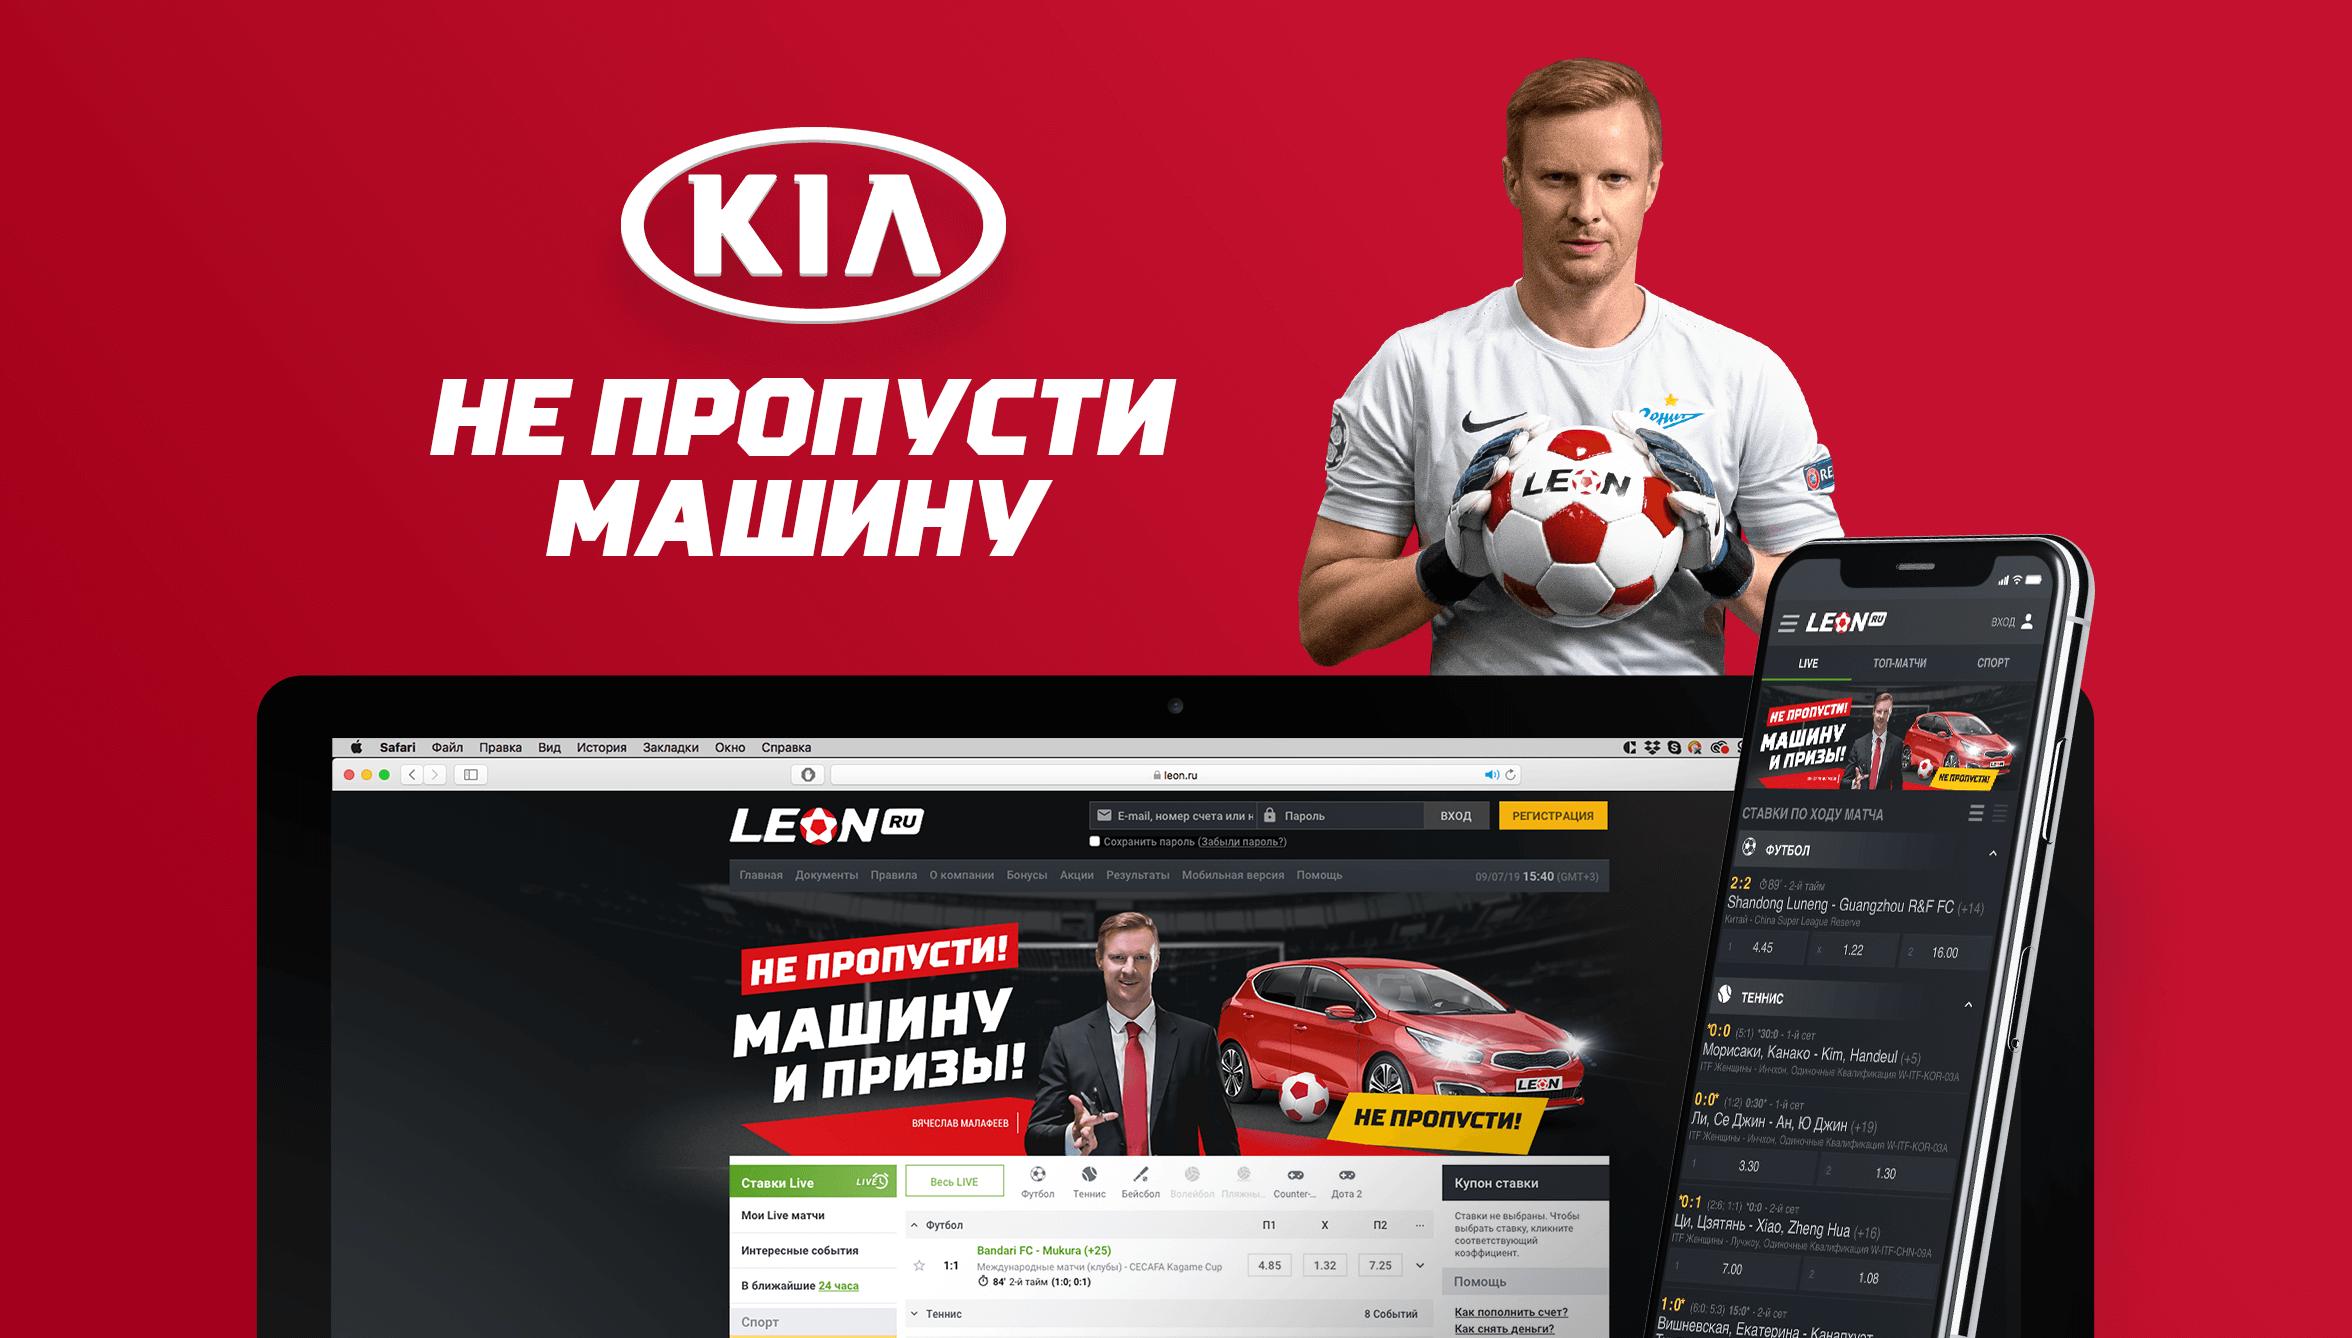 KIA + Malafeyev